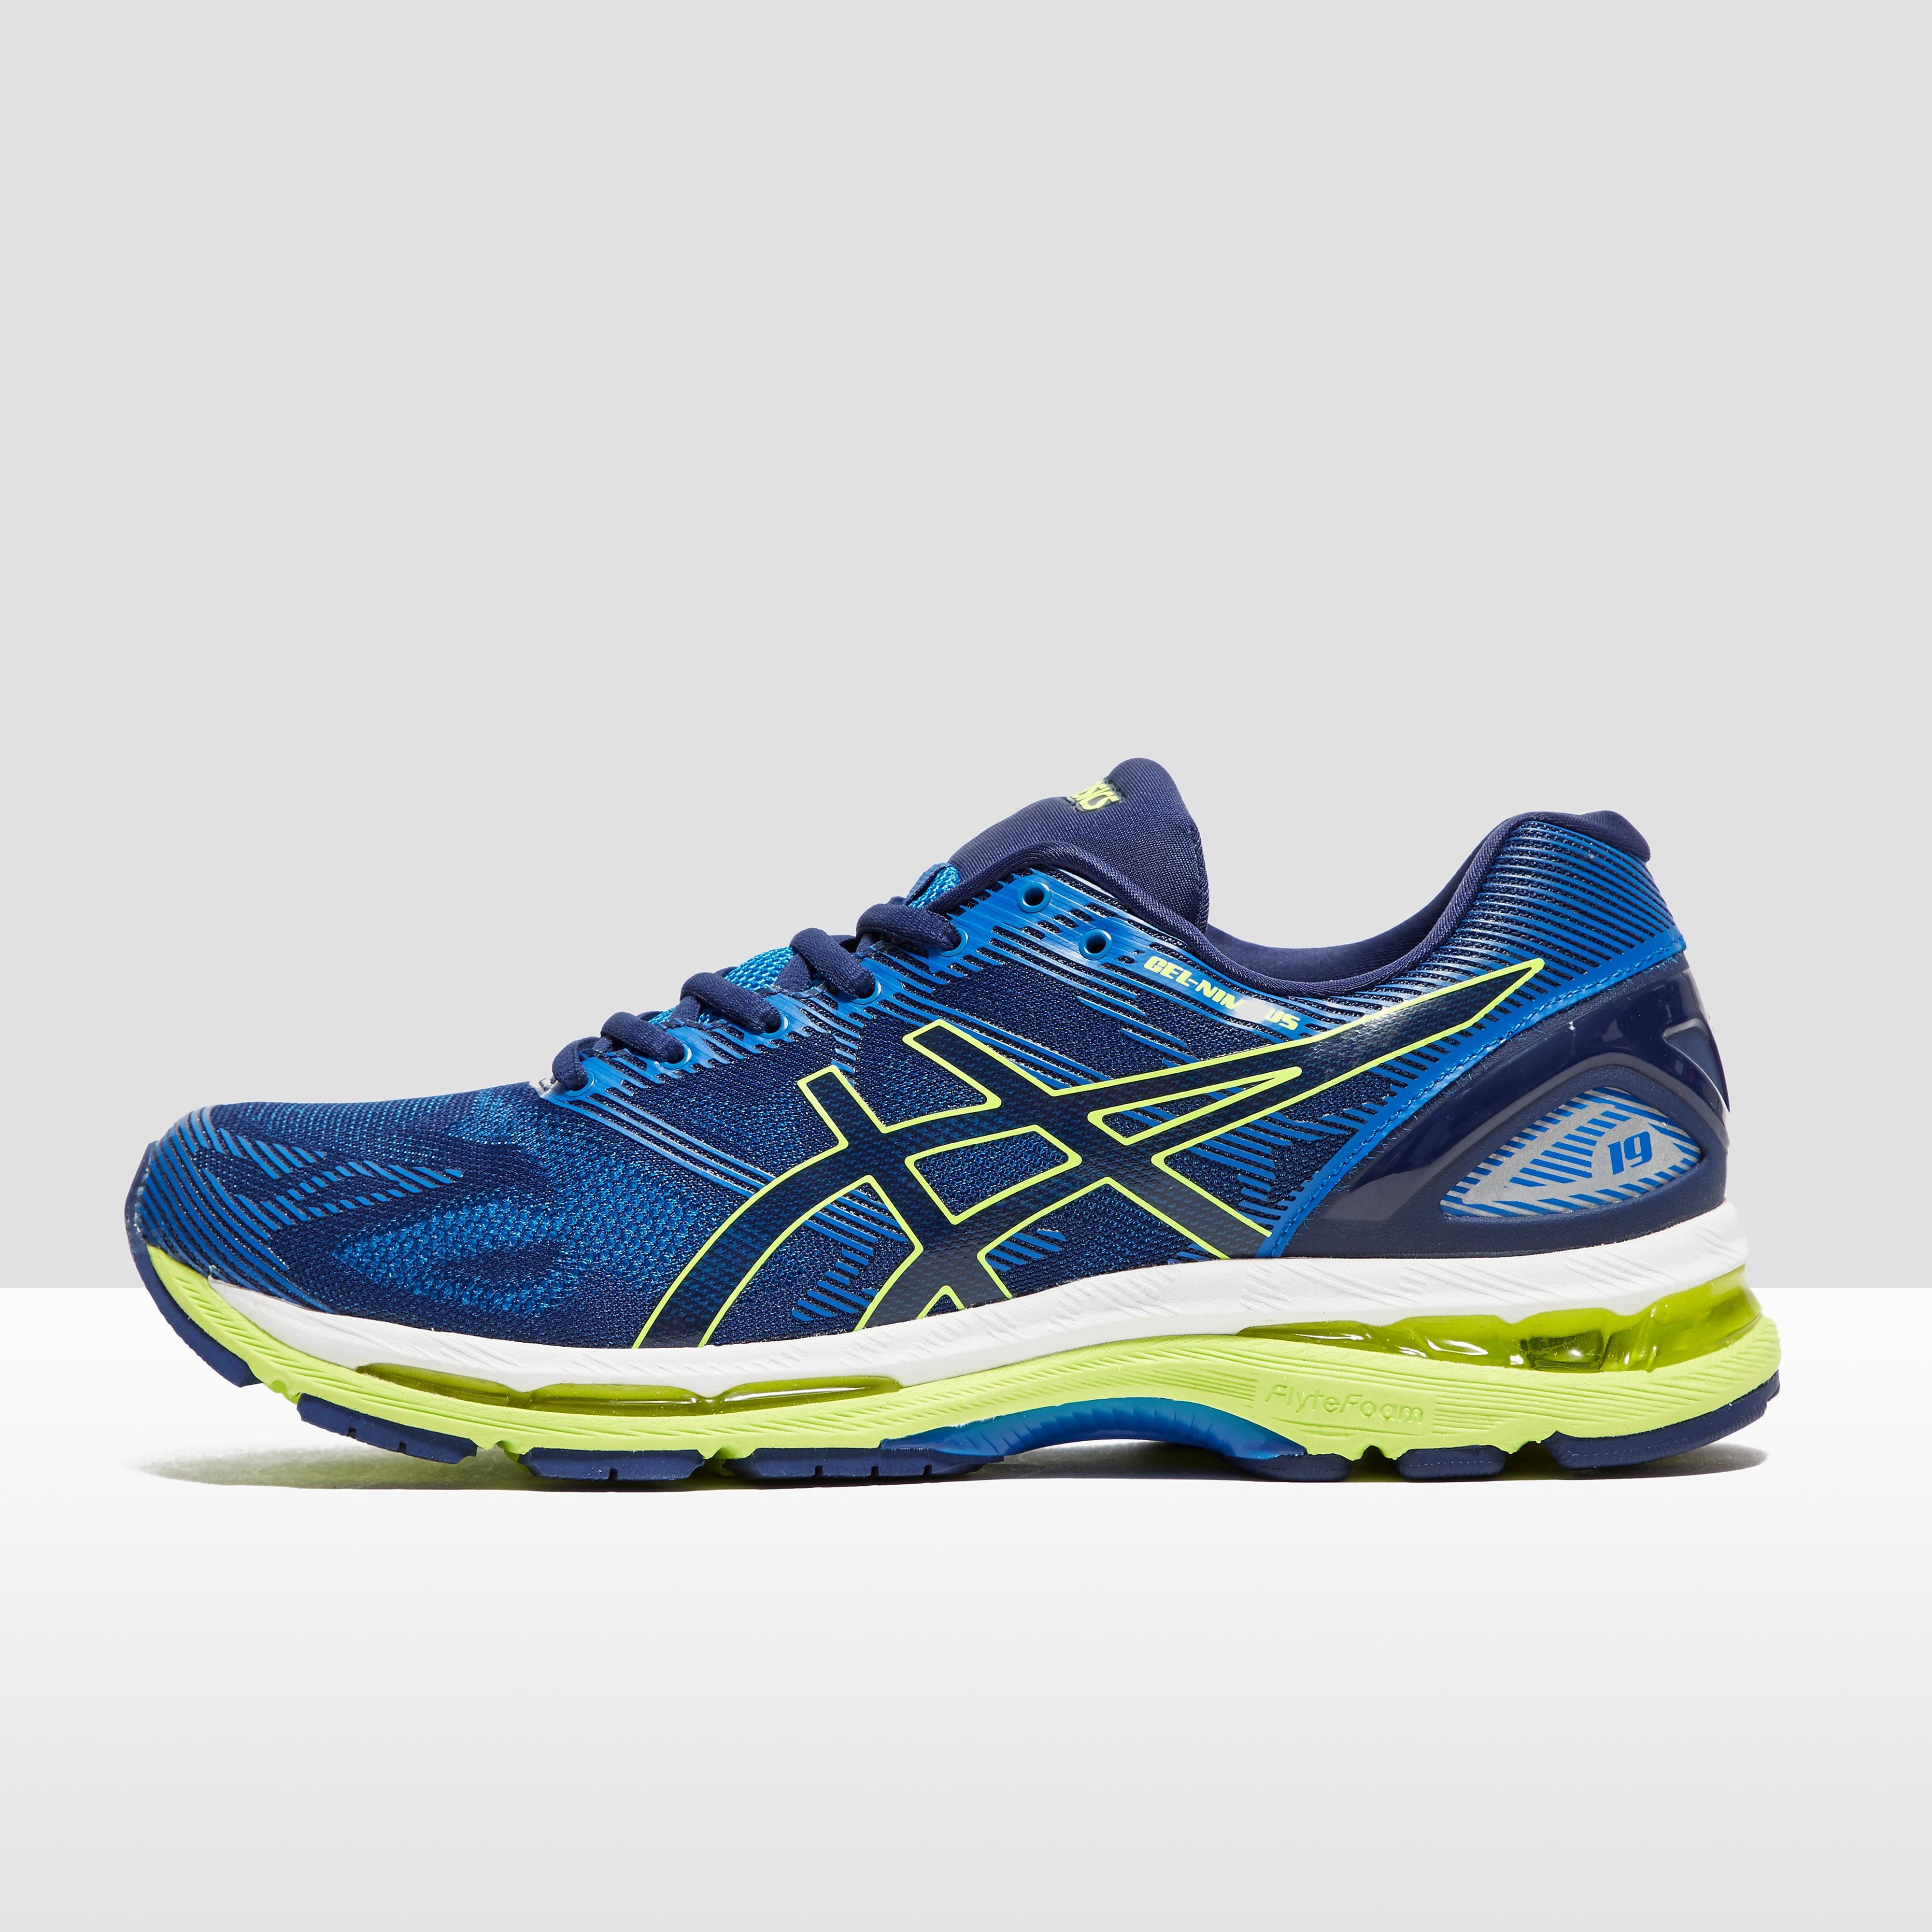 Asics Men's Gel Nimbus 19 Running shoes